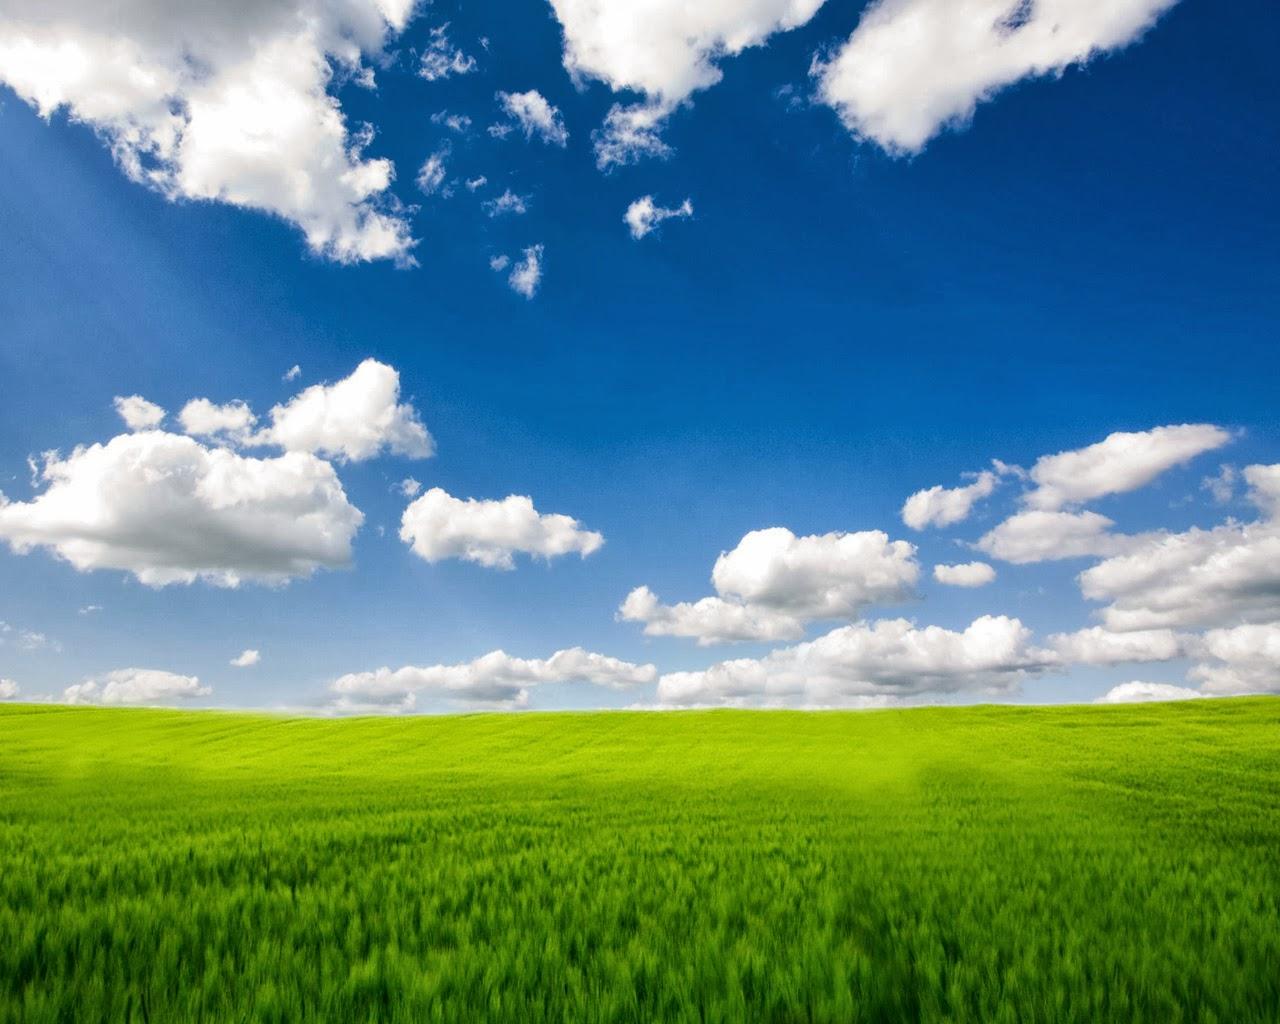 Beautiful Blue Sky Wallpaper 1280x1024